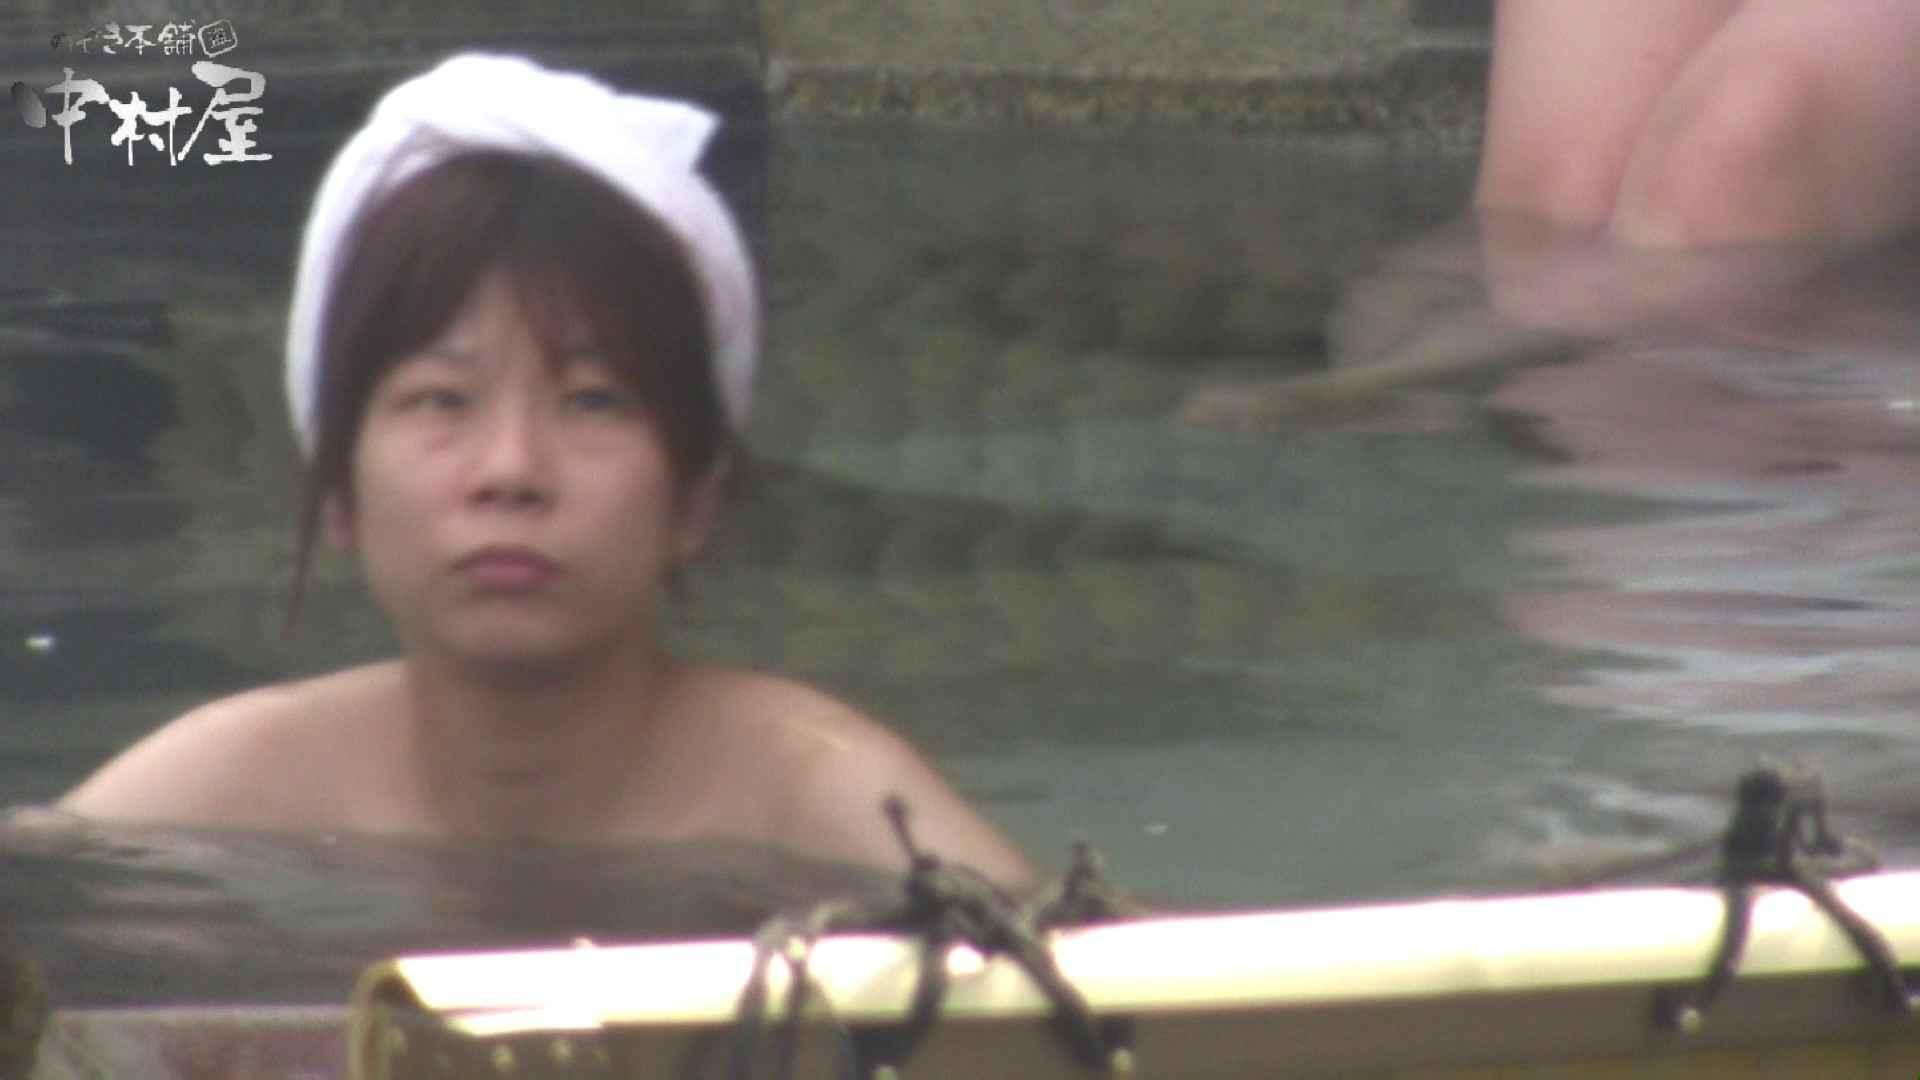 Aquaな露天風呂Vol.926 露天 | 0  33連発 25